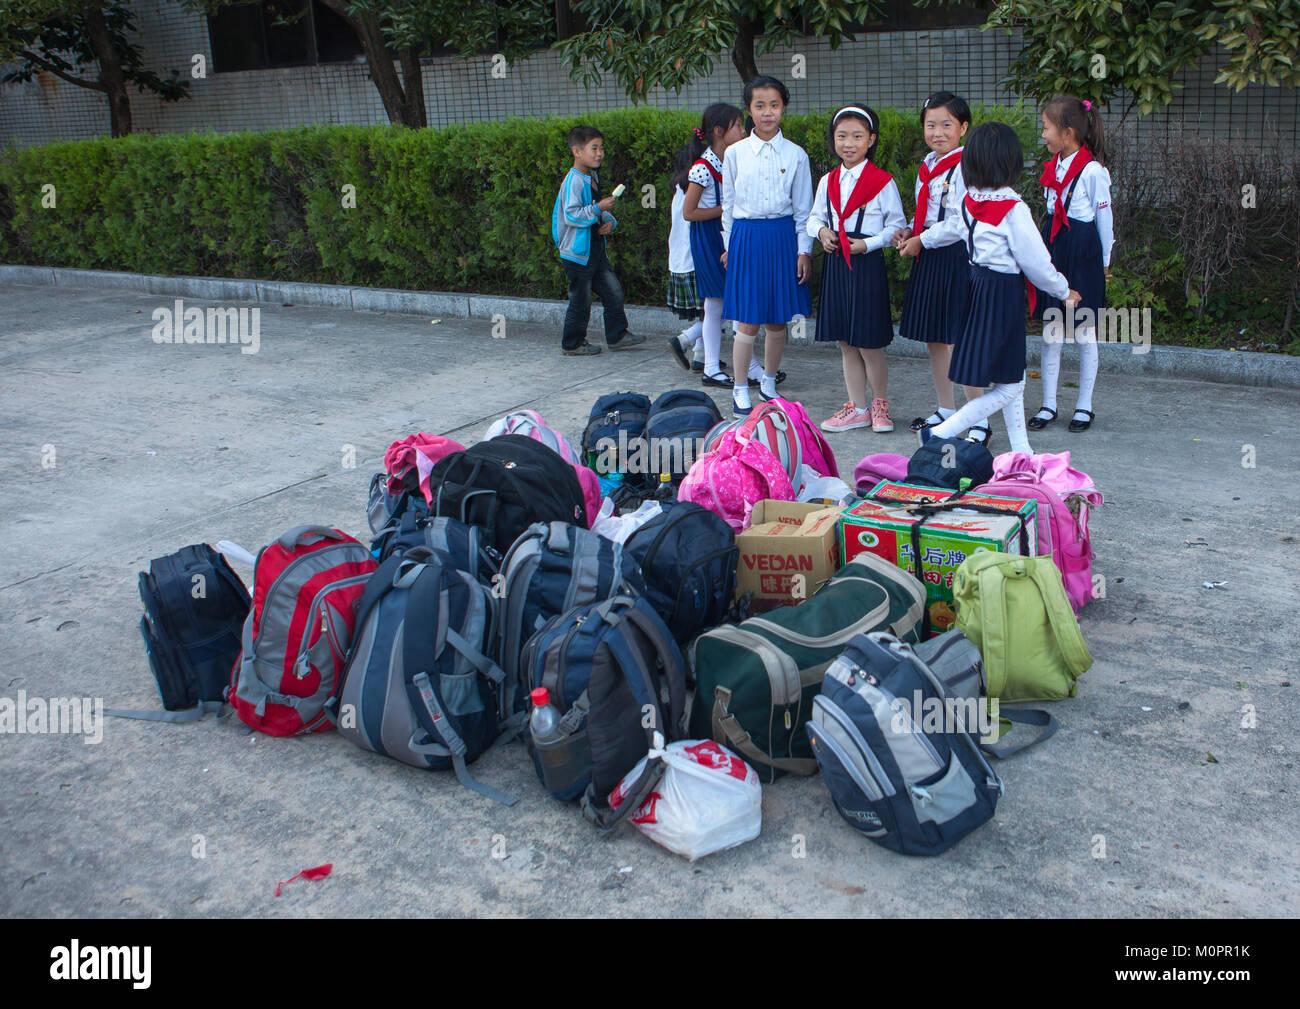 North Korean pioneers arriving in Songdowon international children's camp, Kangwon Province, Wonsan, North Korea - Stock Image